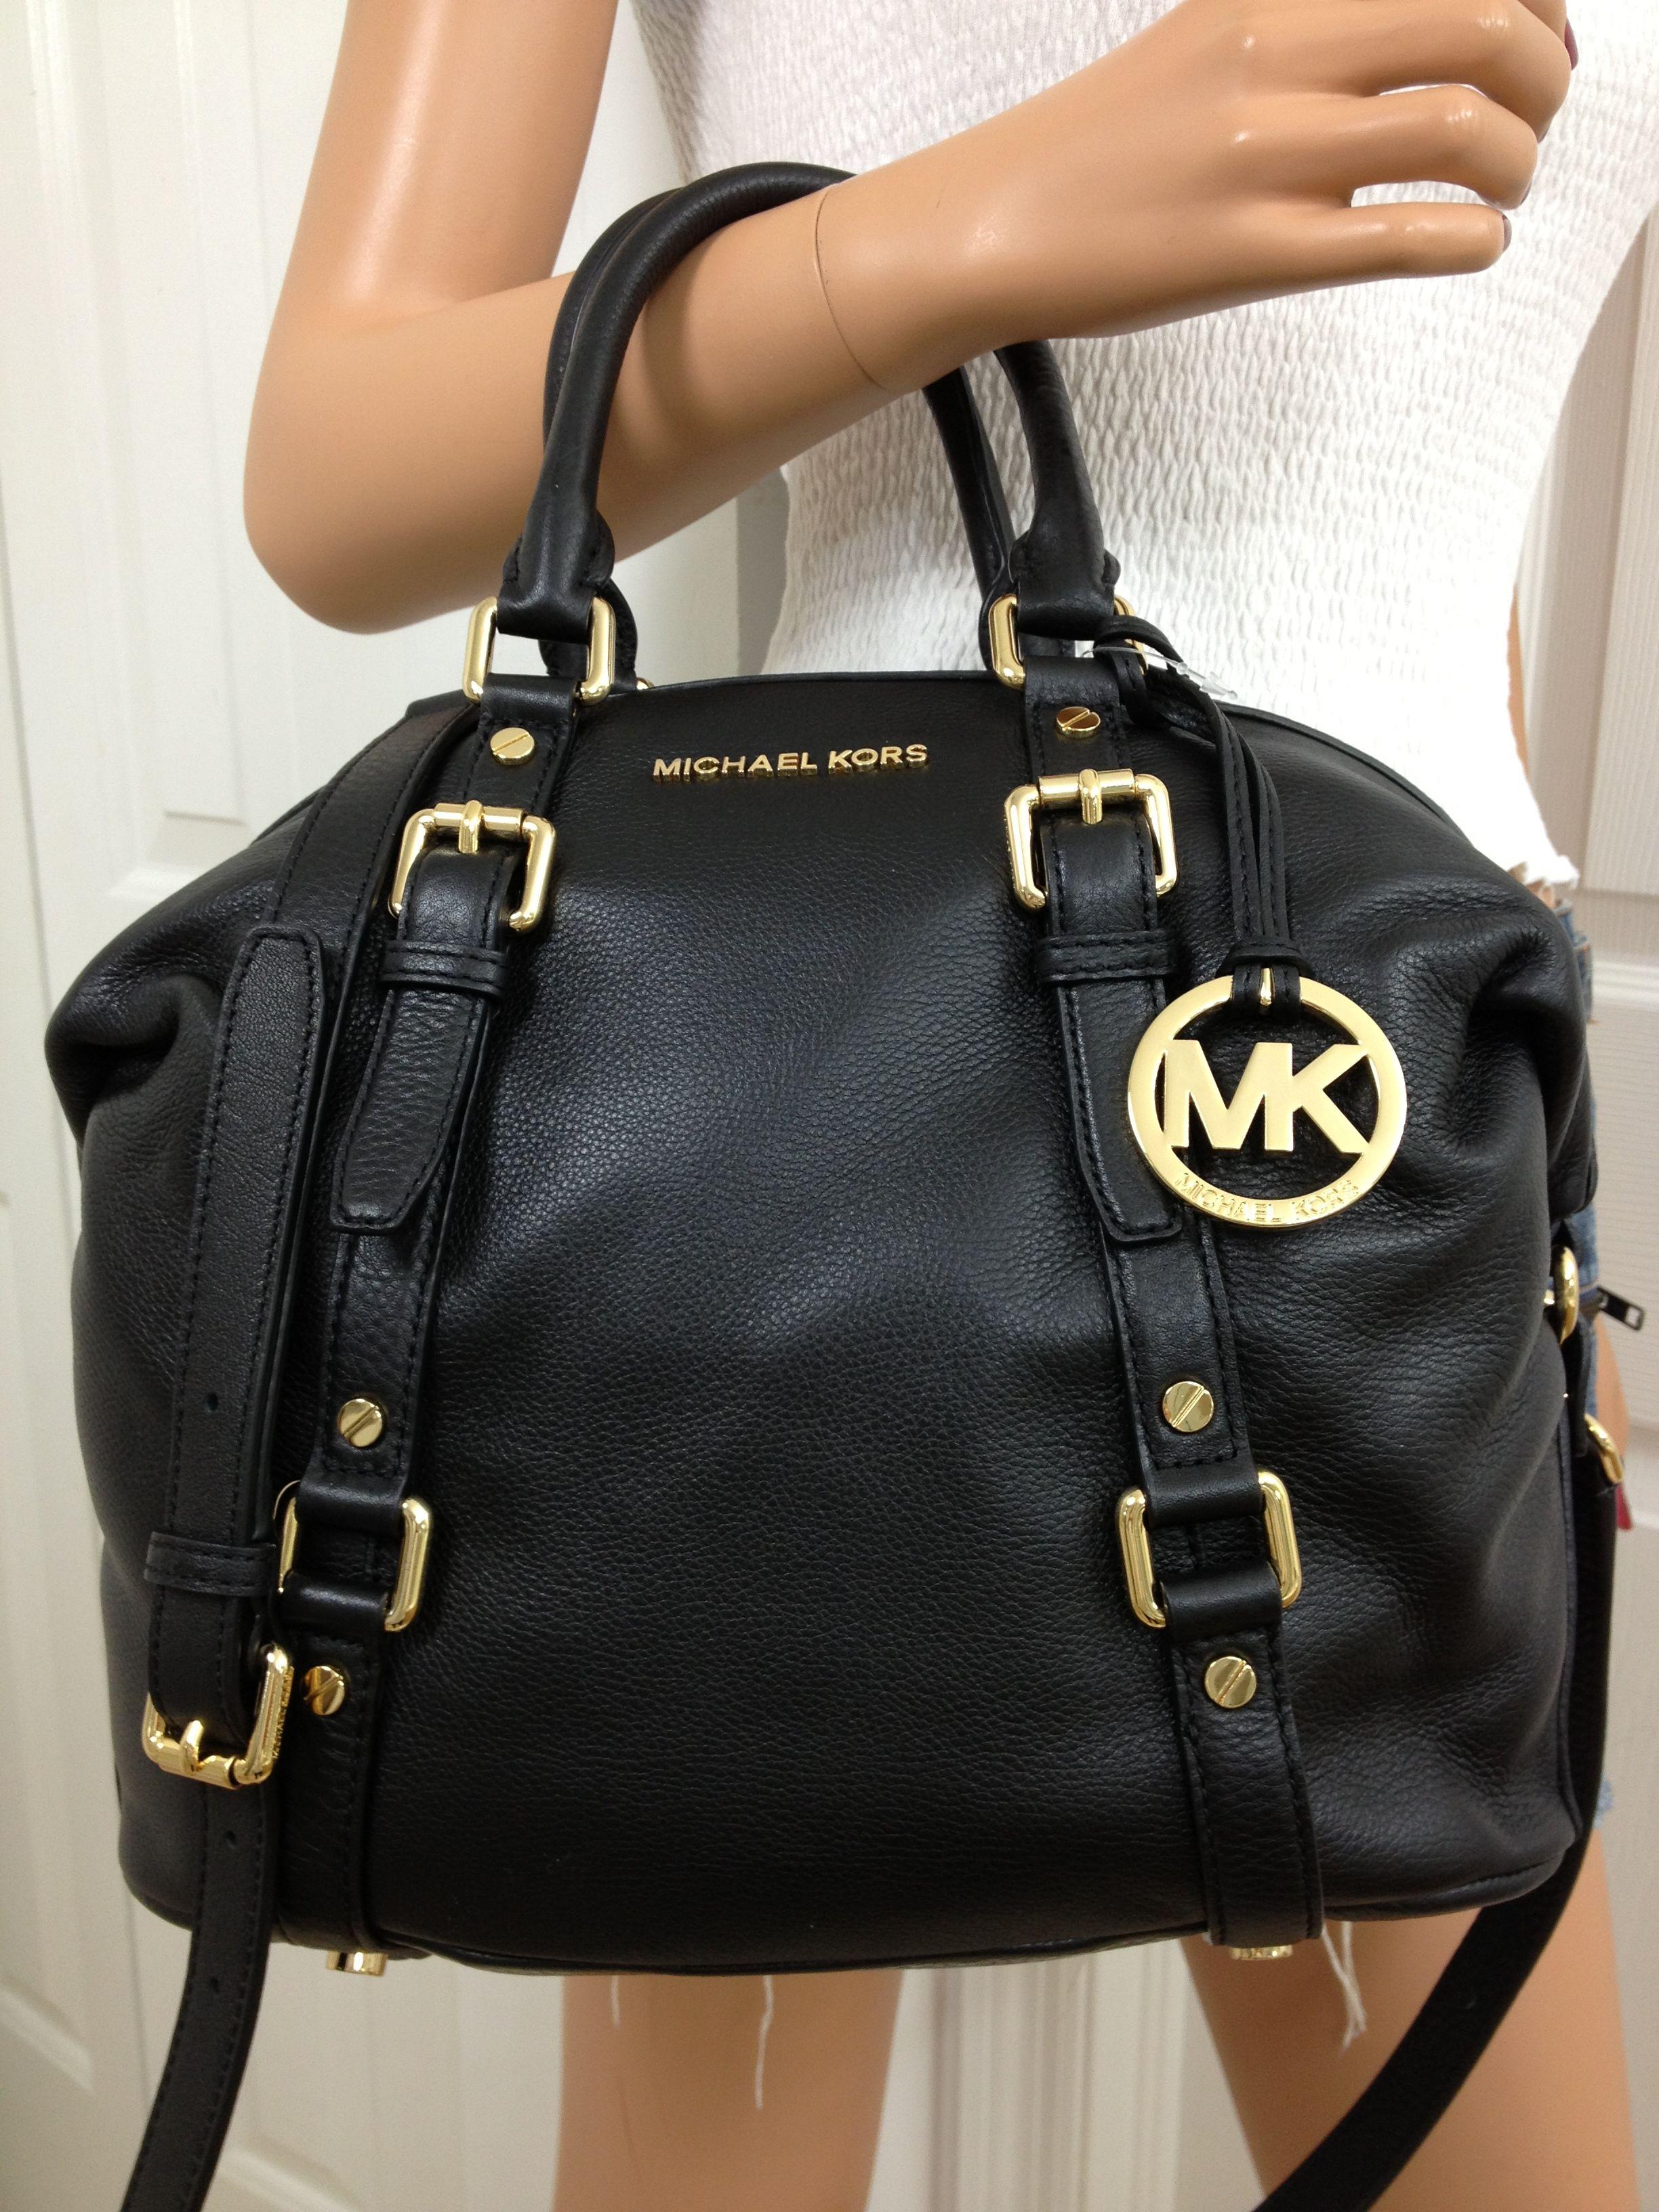 used black michael kors tote black mk purses with tan stripes